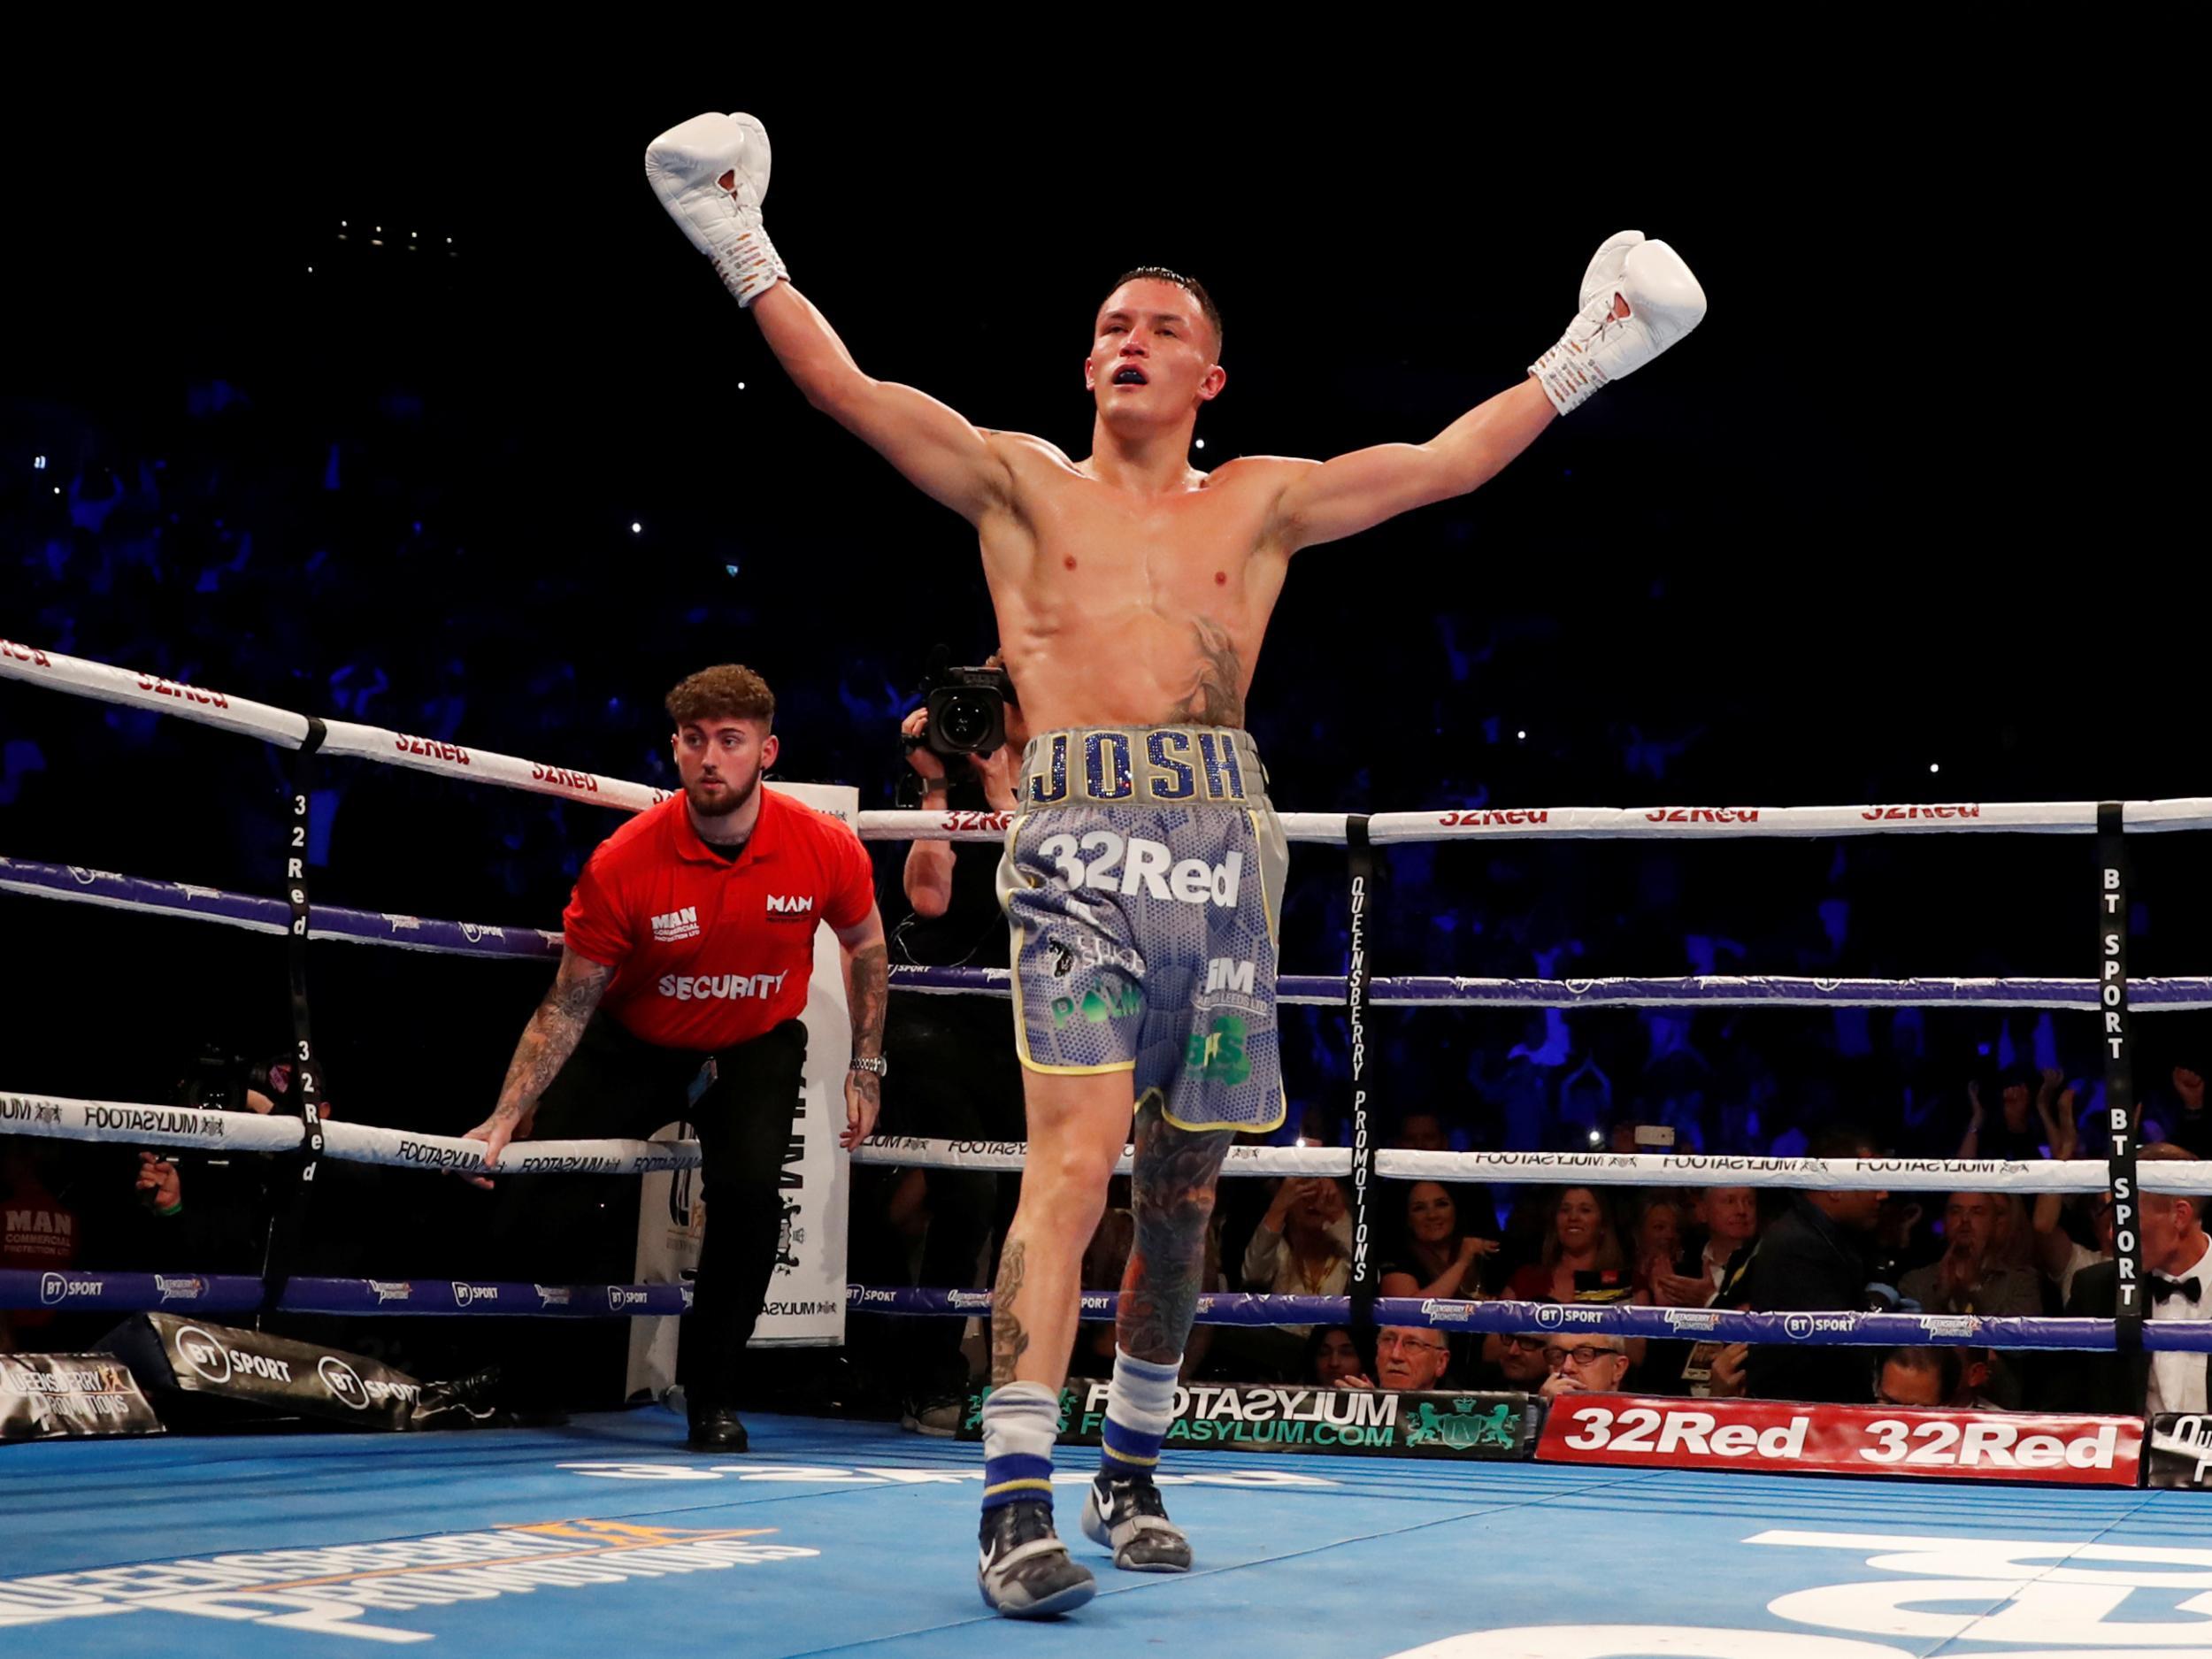 Josh Warrington: After sacrifice of Sofiane Takoucht, a world title unification and mire of boxing politics awaits